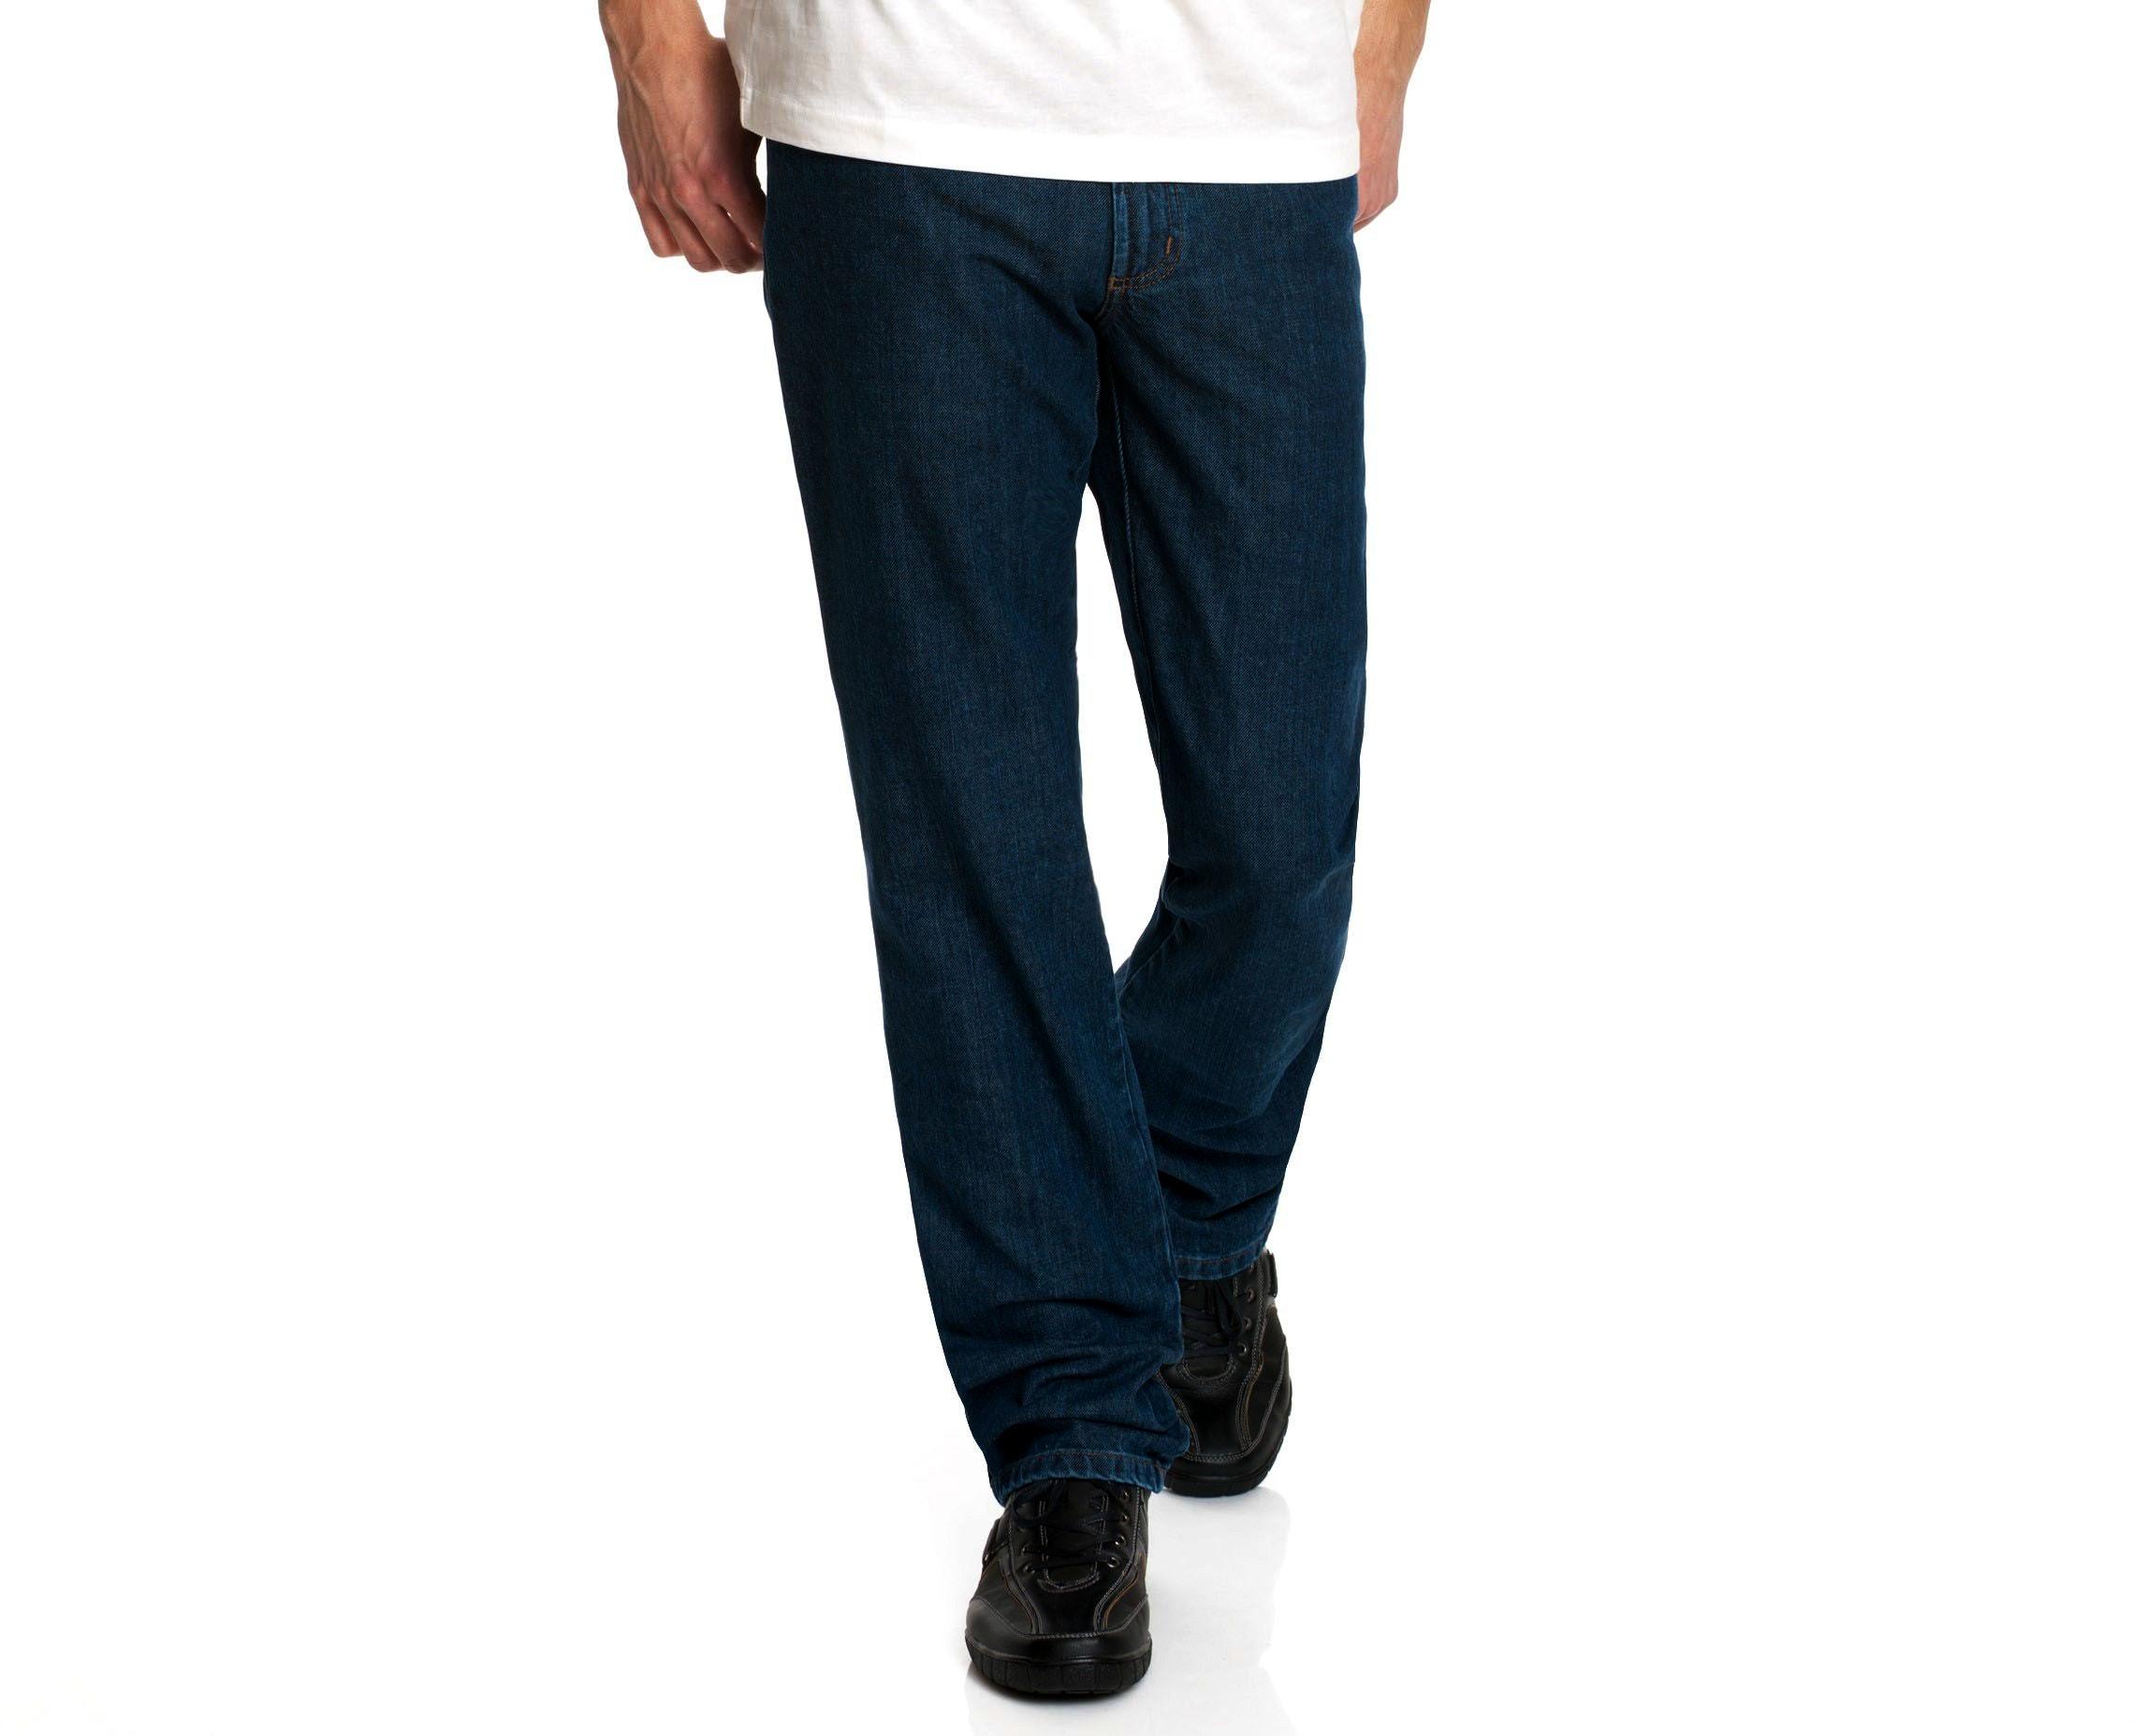 Revils Jeans 302 stonewash